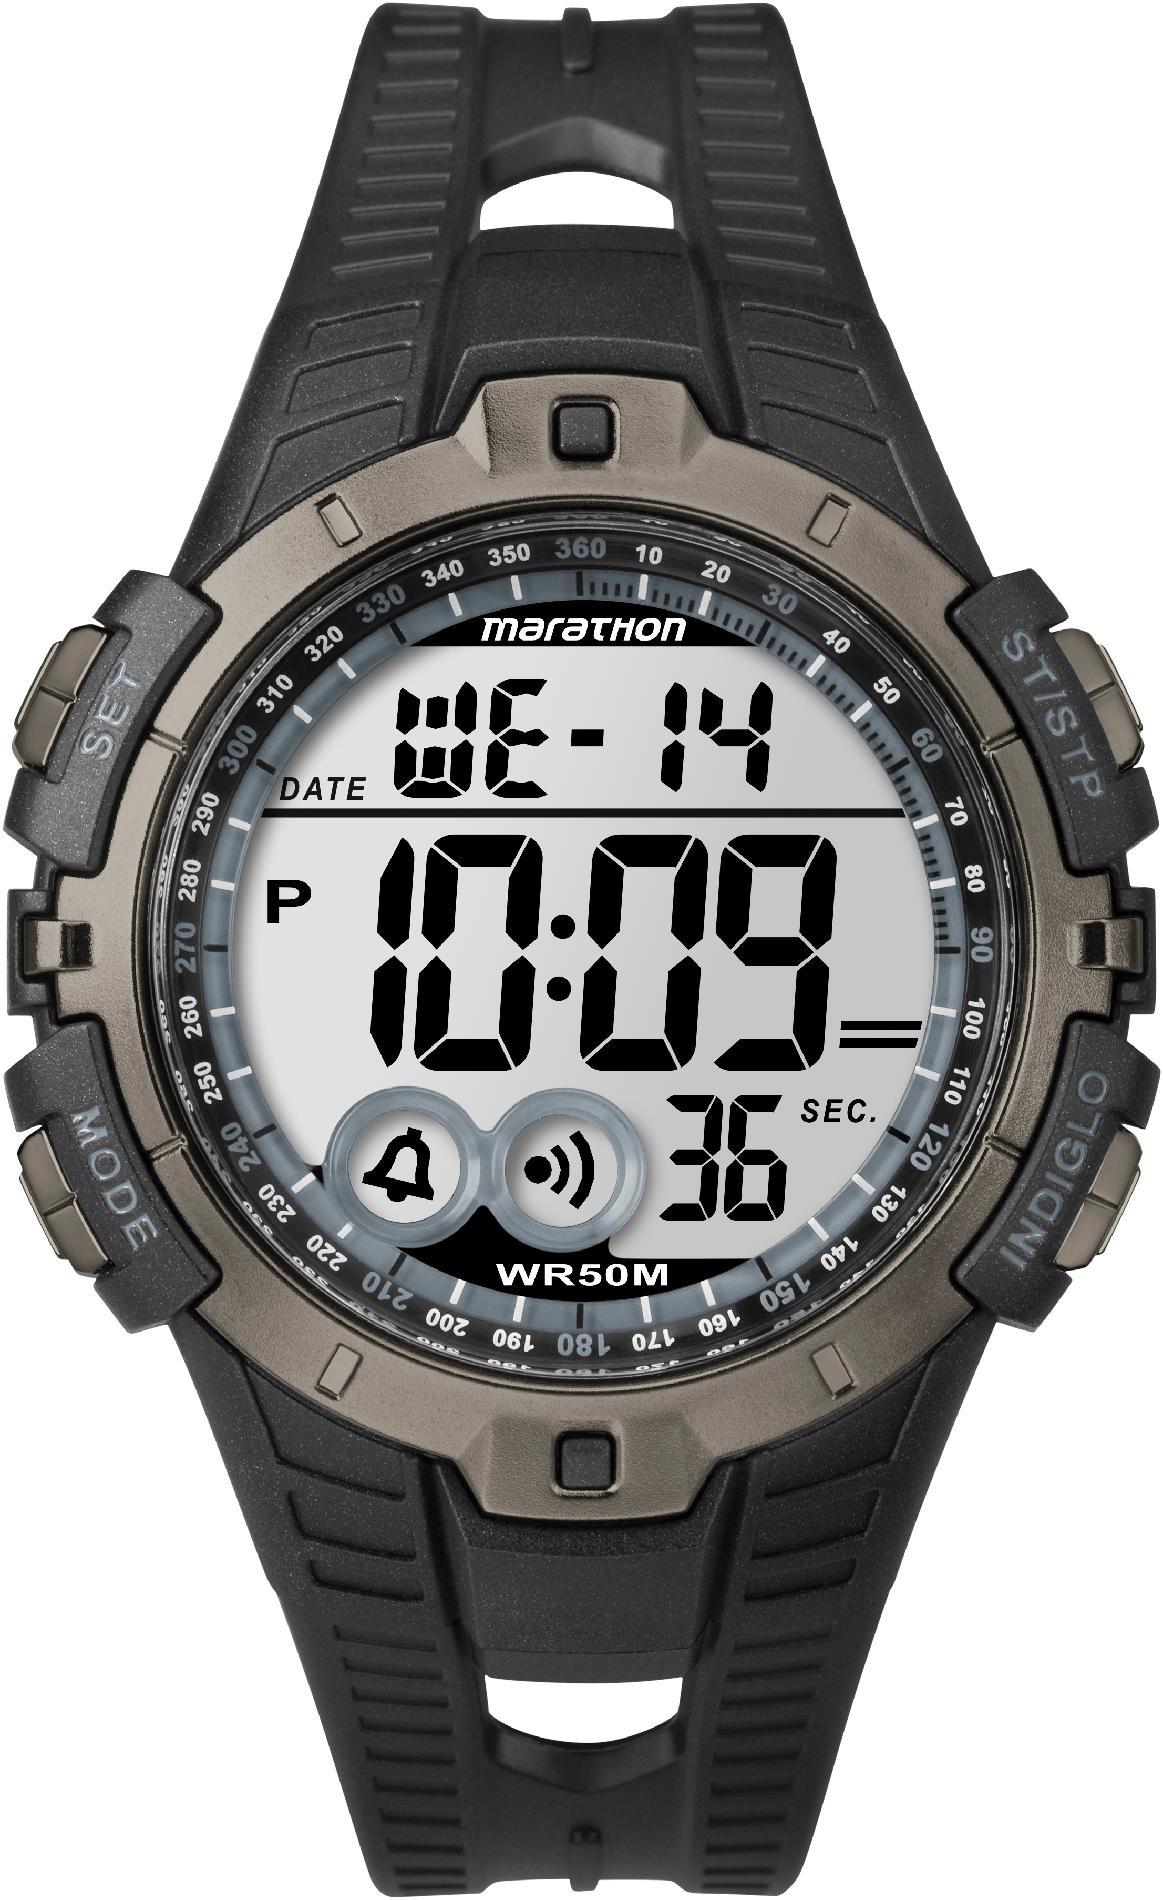 Marathon by Timex Men's Digital Full-Size Watch